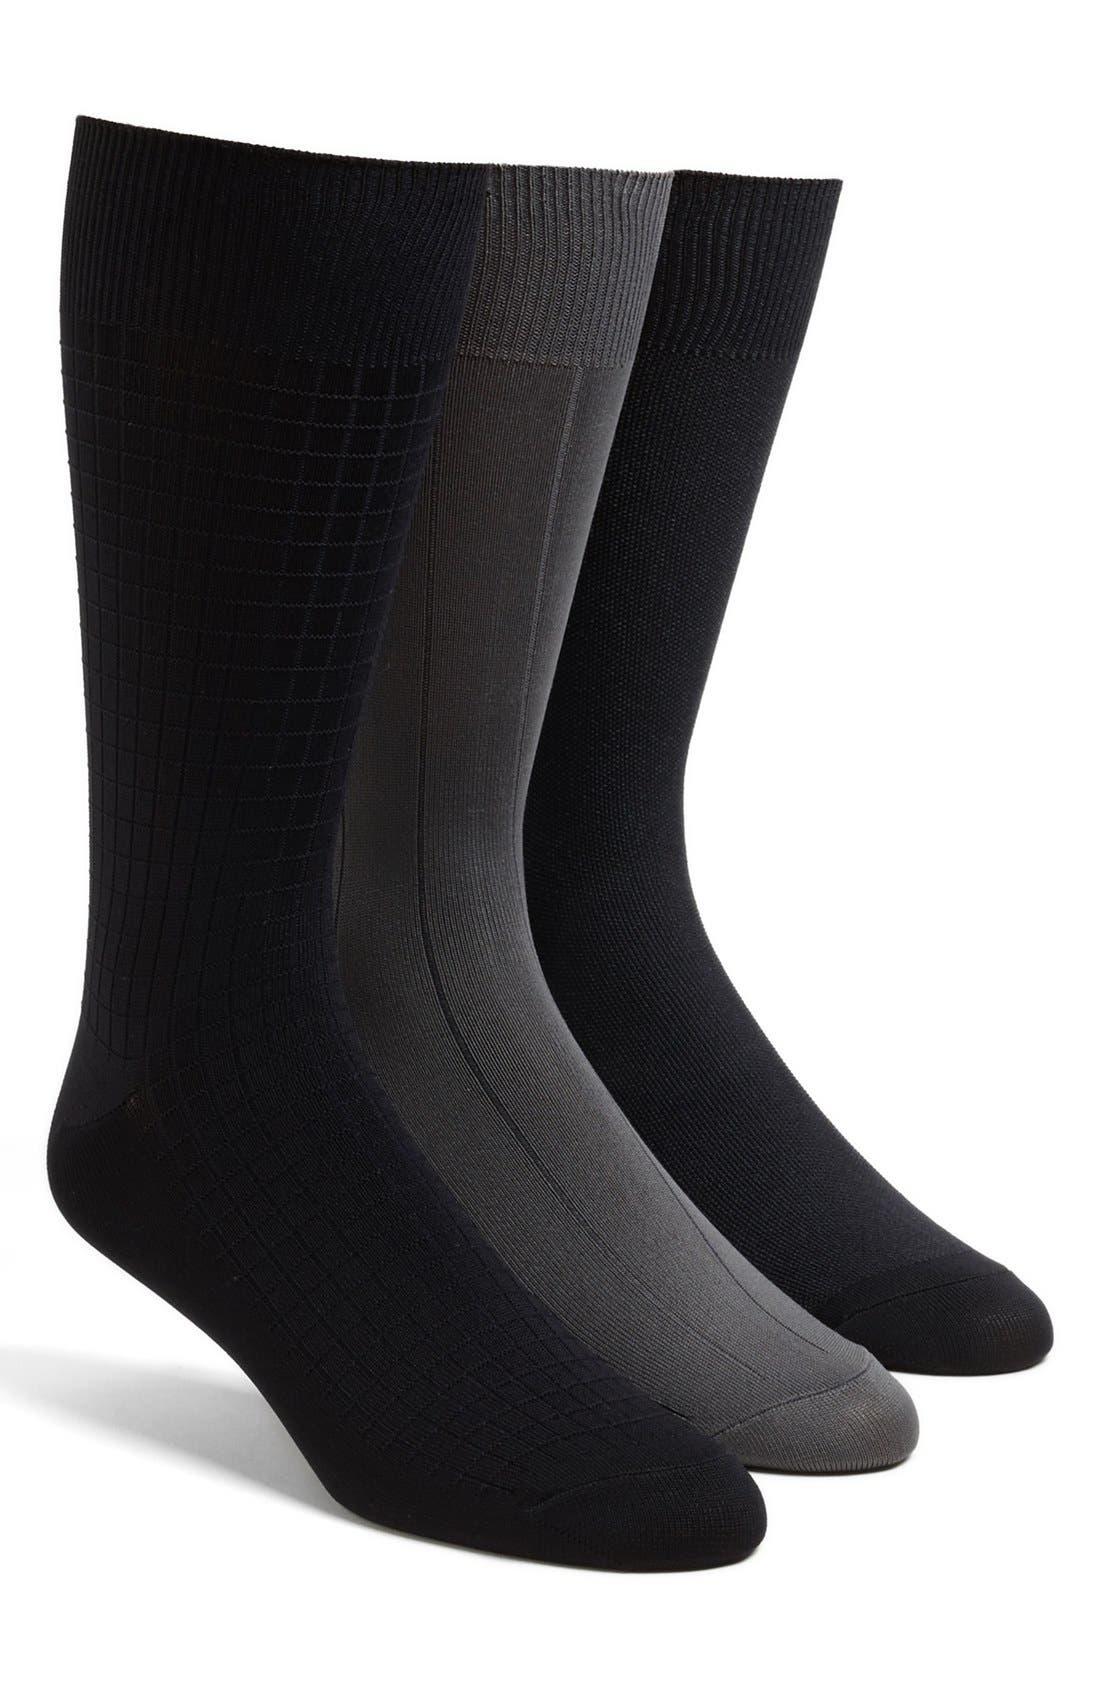 Main Image - Calvin Klein 3-Pack Microfiber Socks